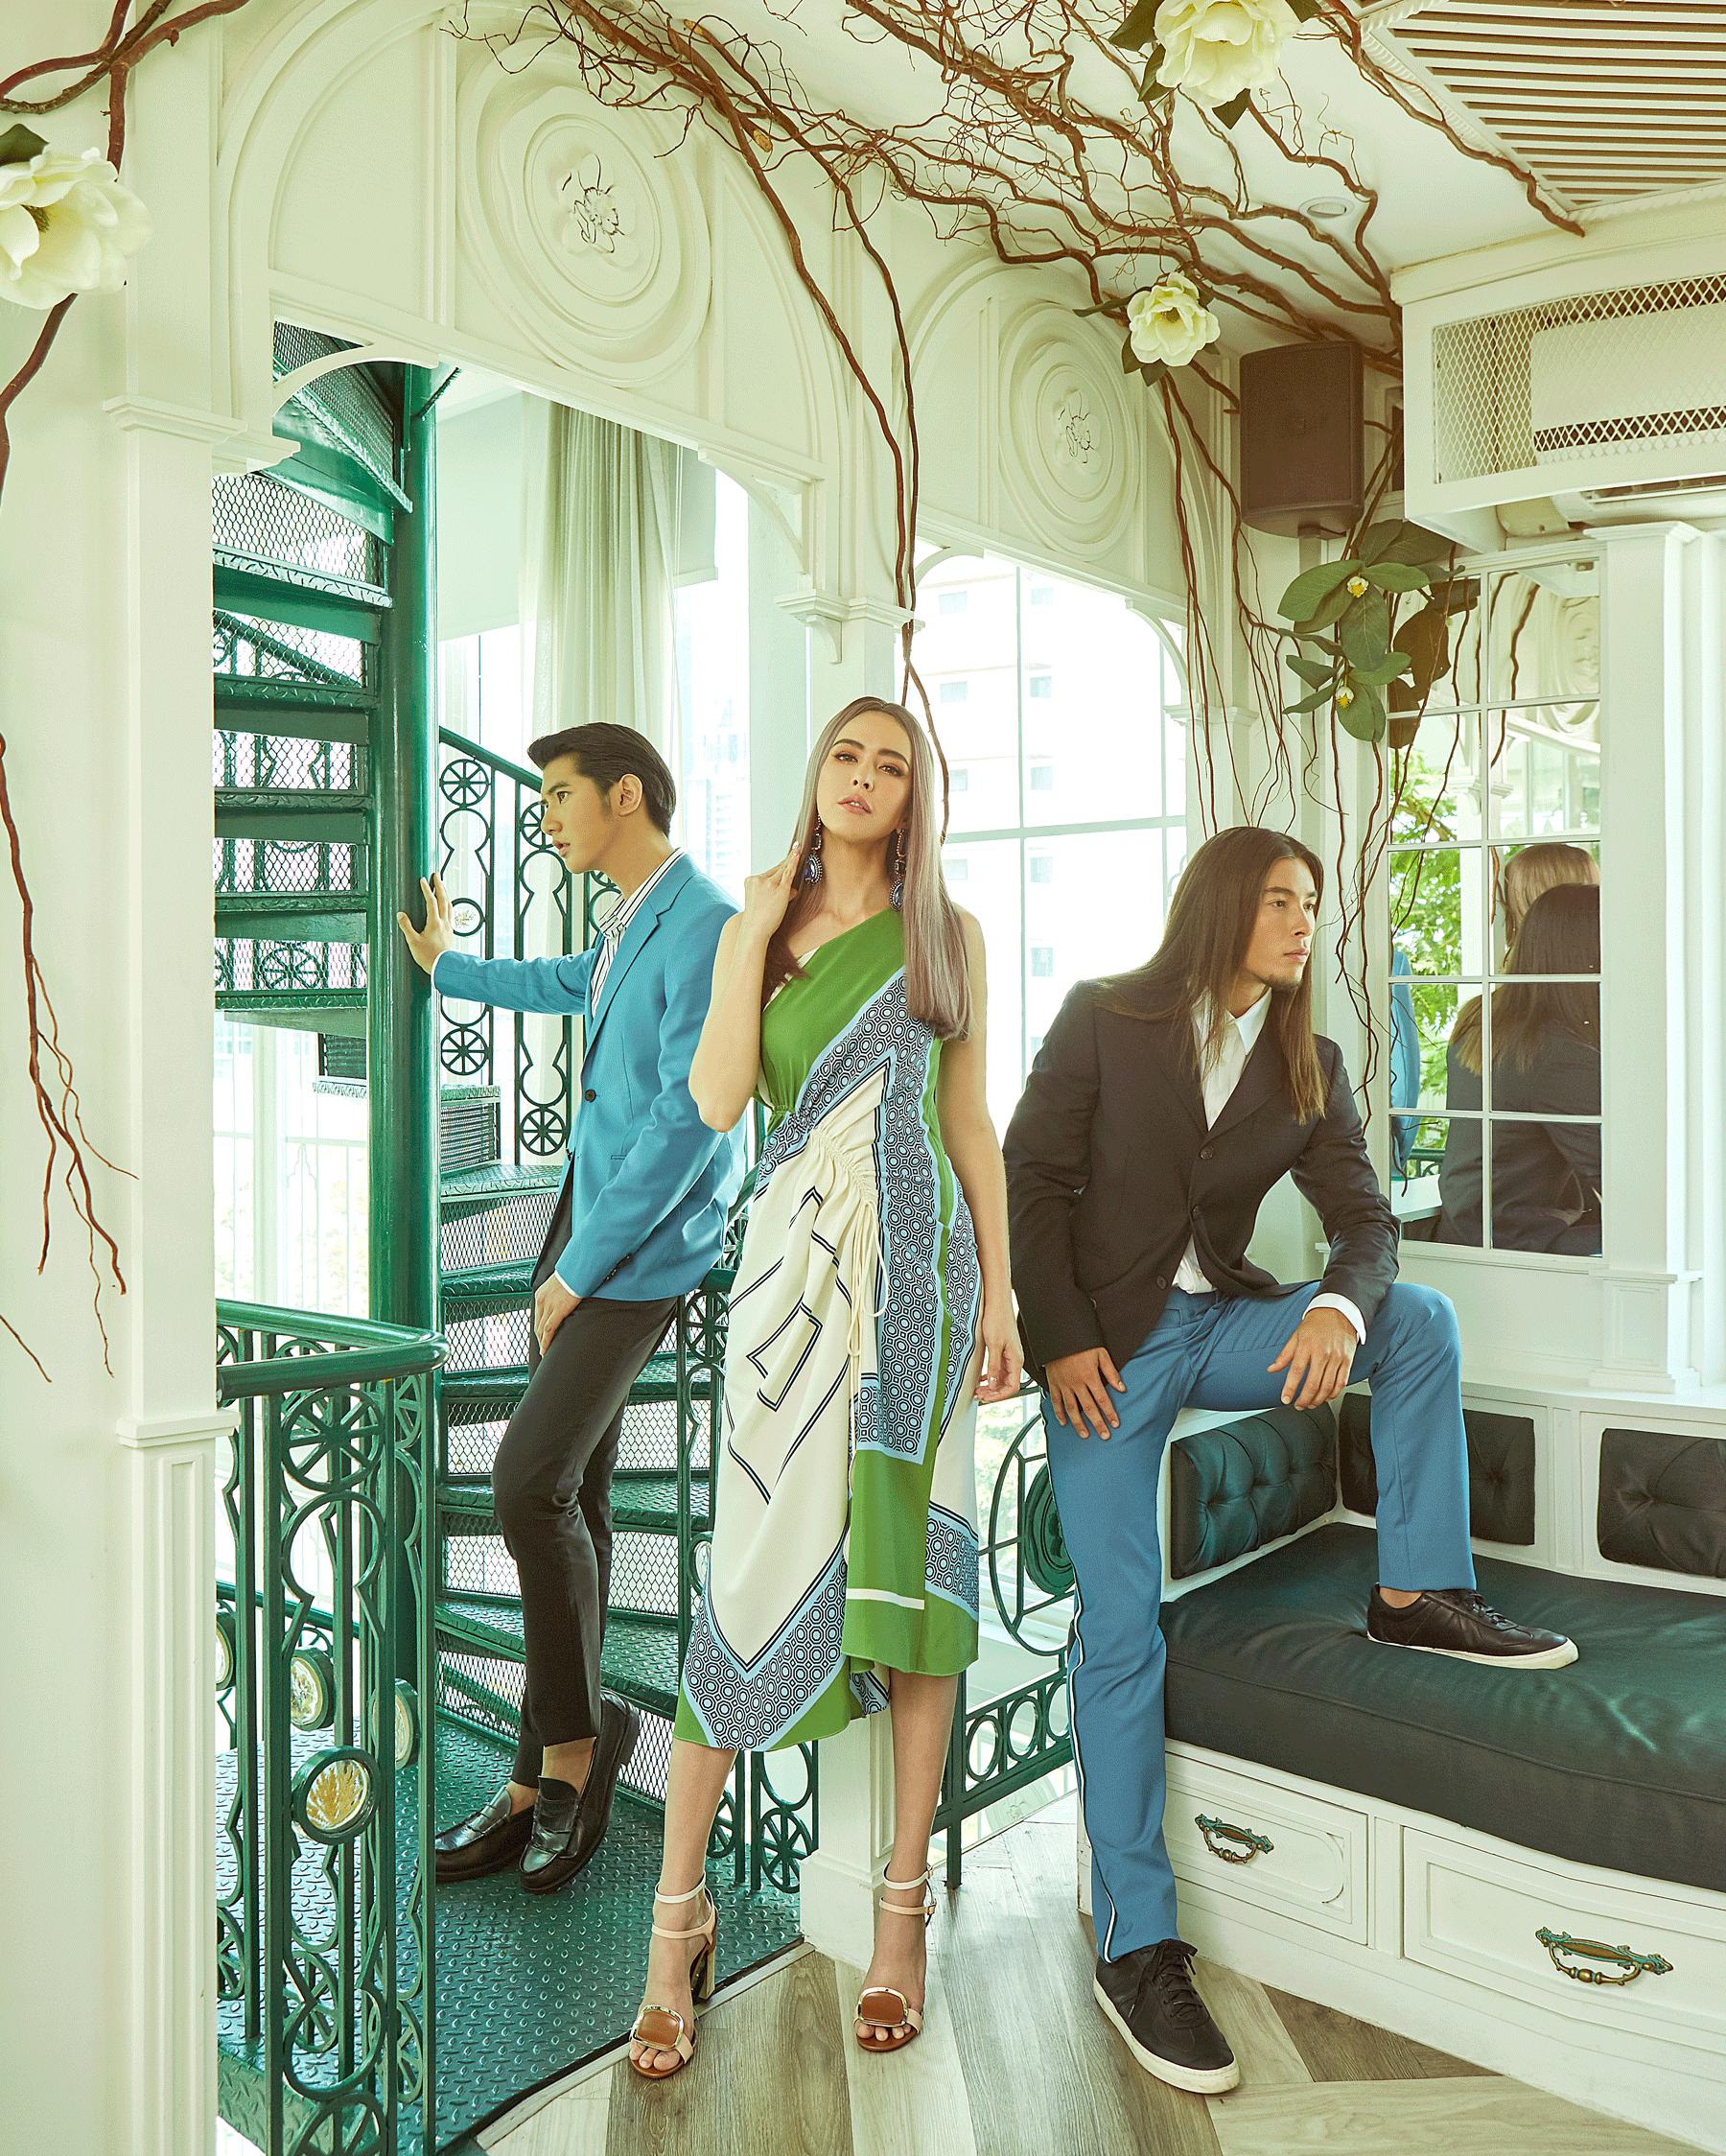 Sririta :dress : Tory Burch / shoes : Roger Vivier / earrings : Butler & Wilson London  Man and Felix : clothes : CK Calvin Klein